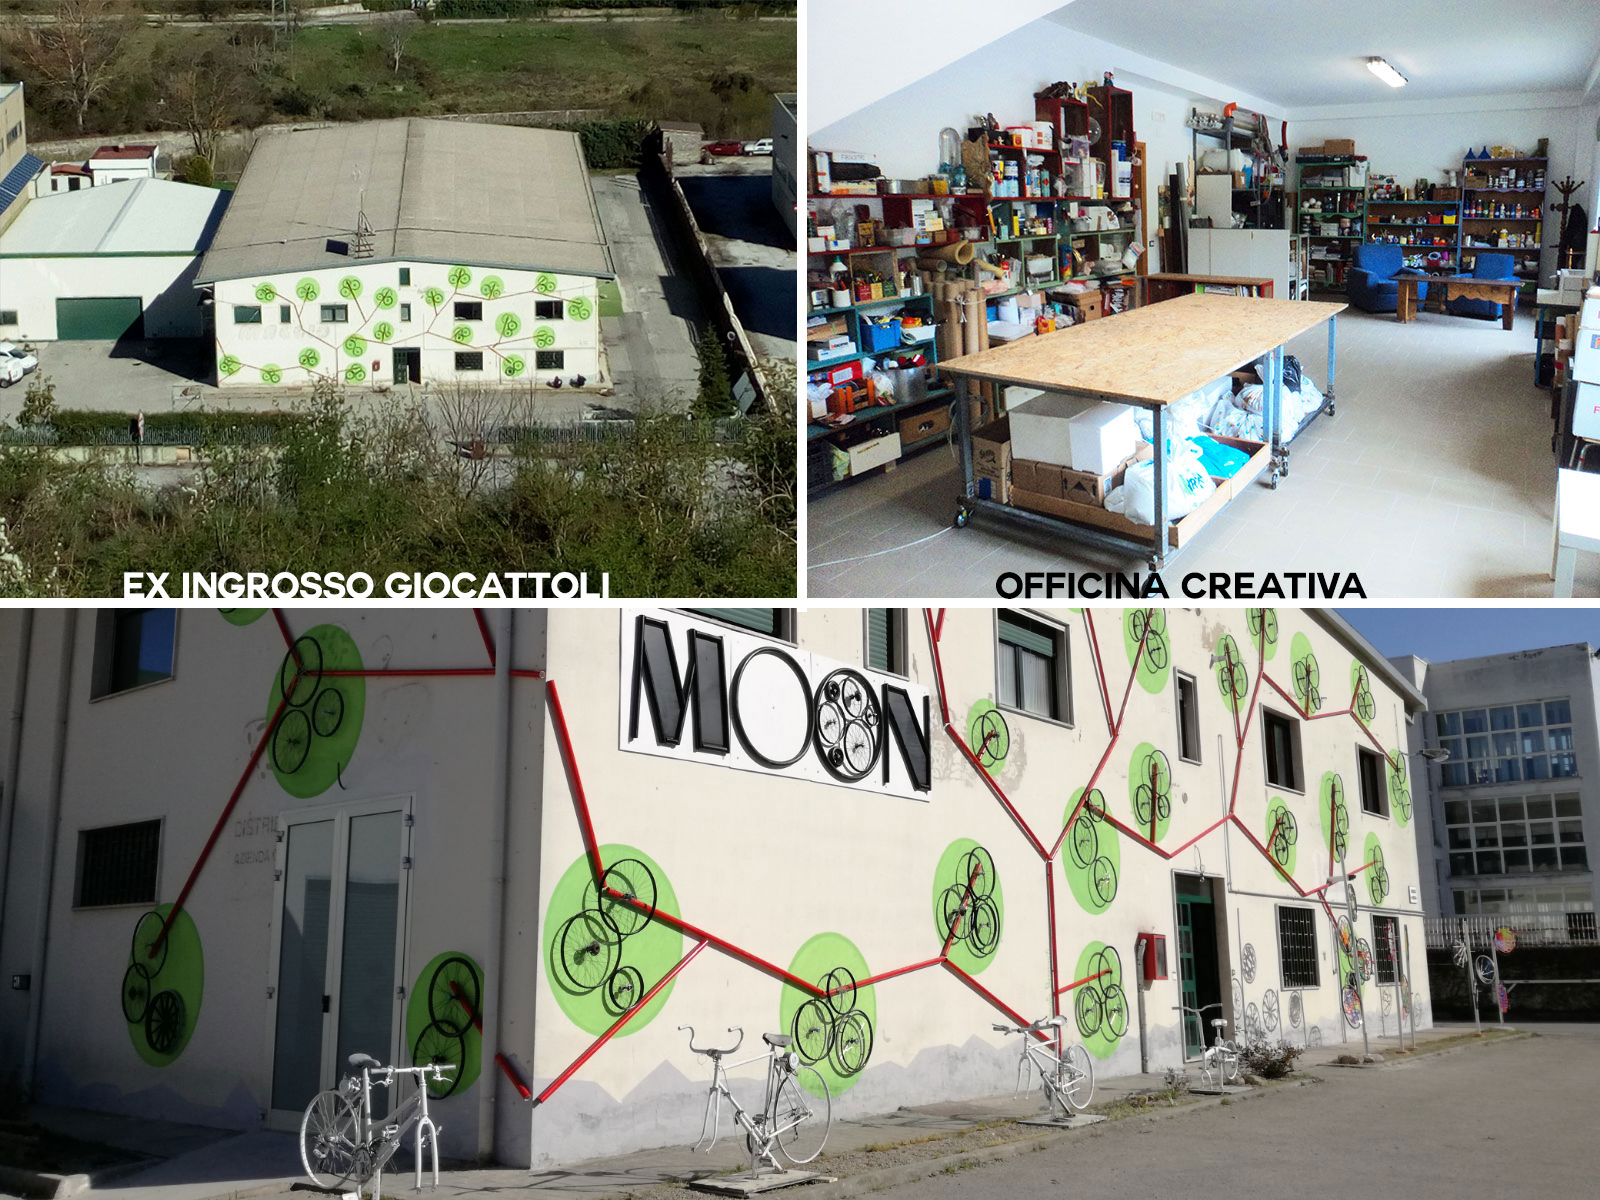 MOON - Museo Officina Oggetti Narranti